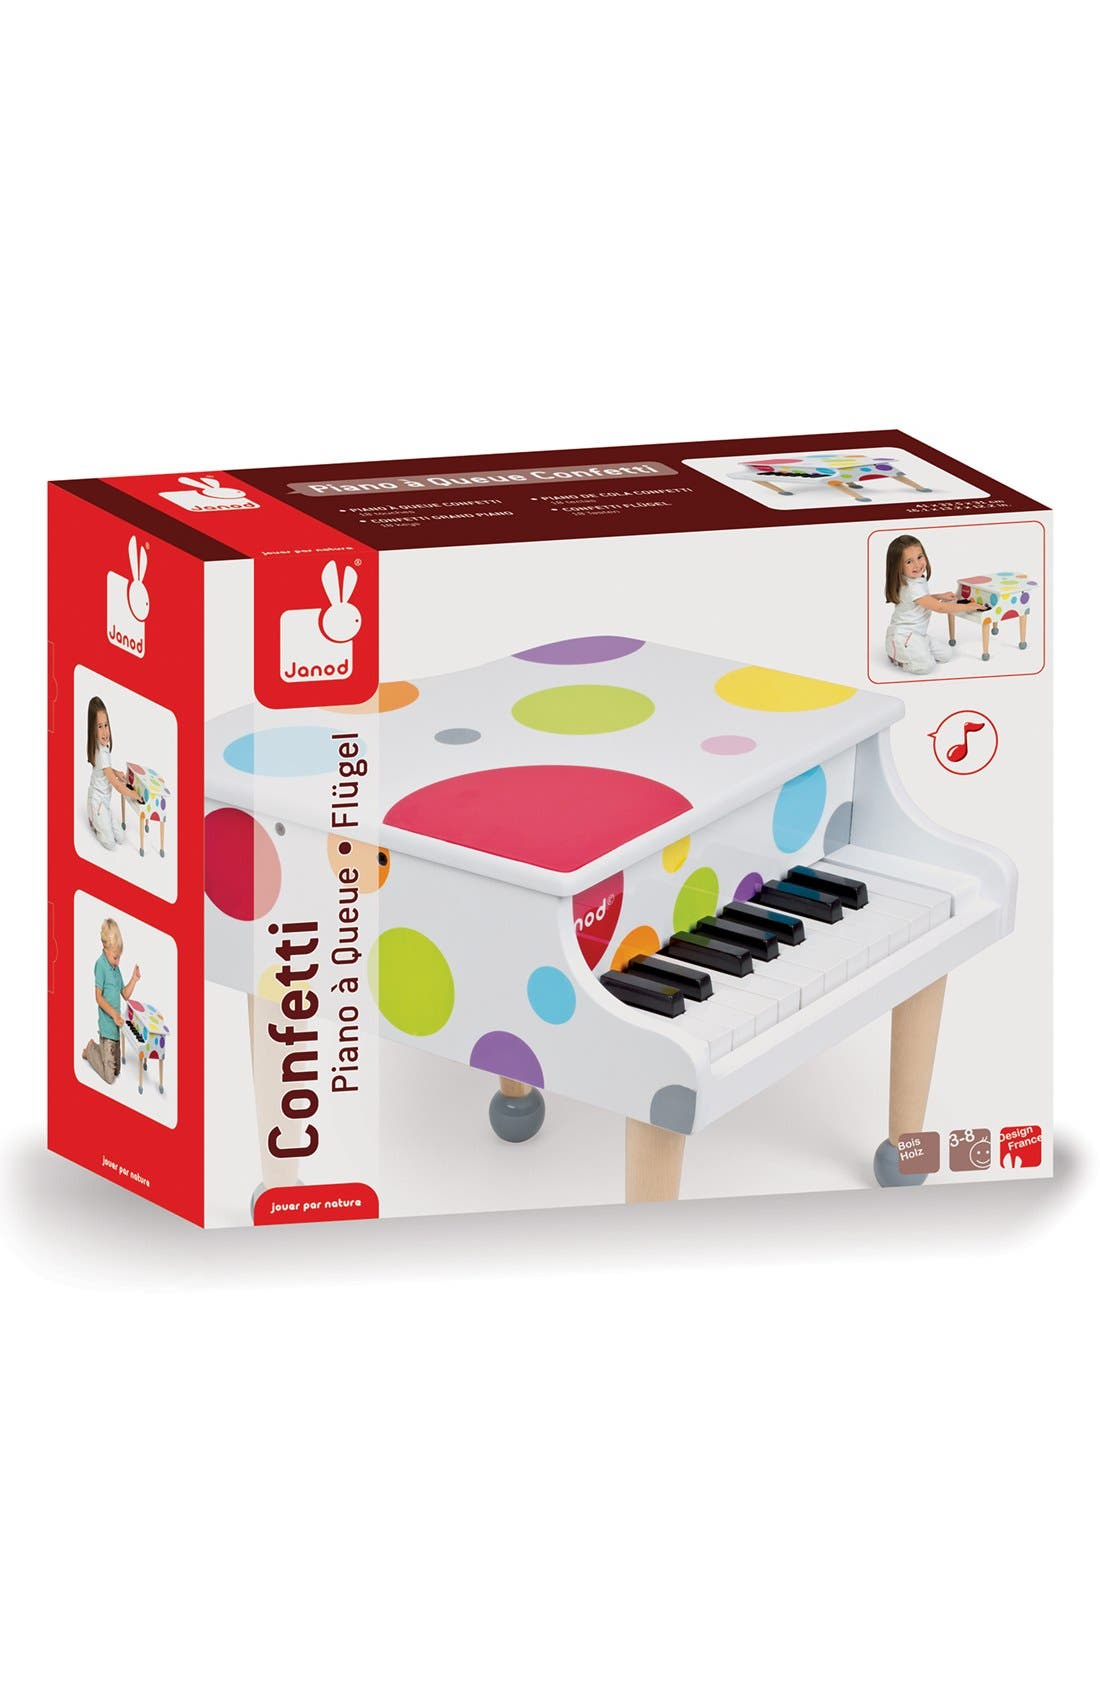 Toddler Janod Confetti Grand Piano Play Set